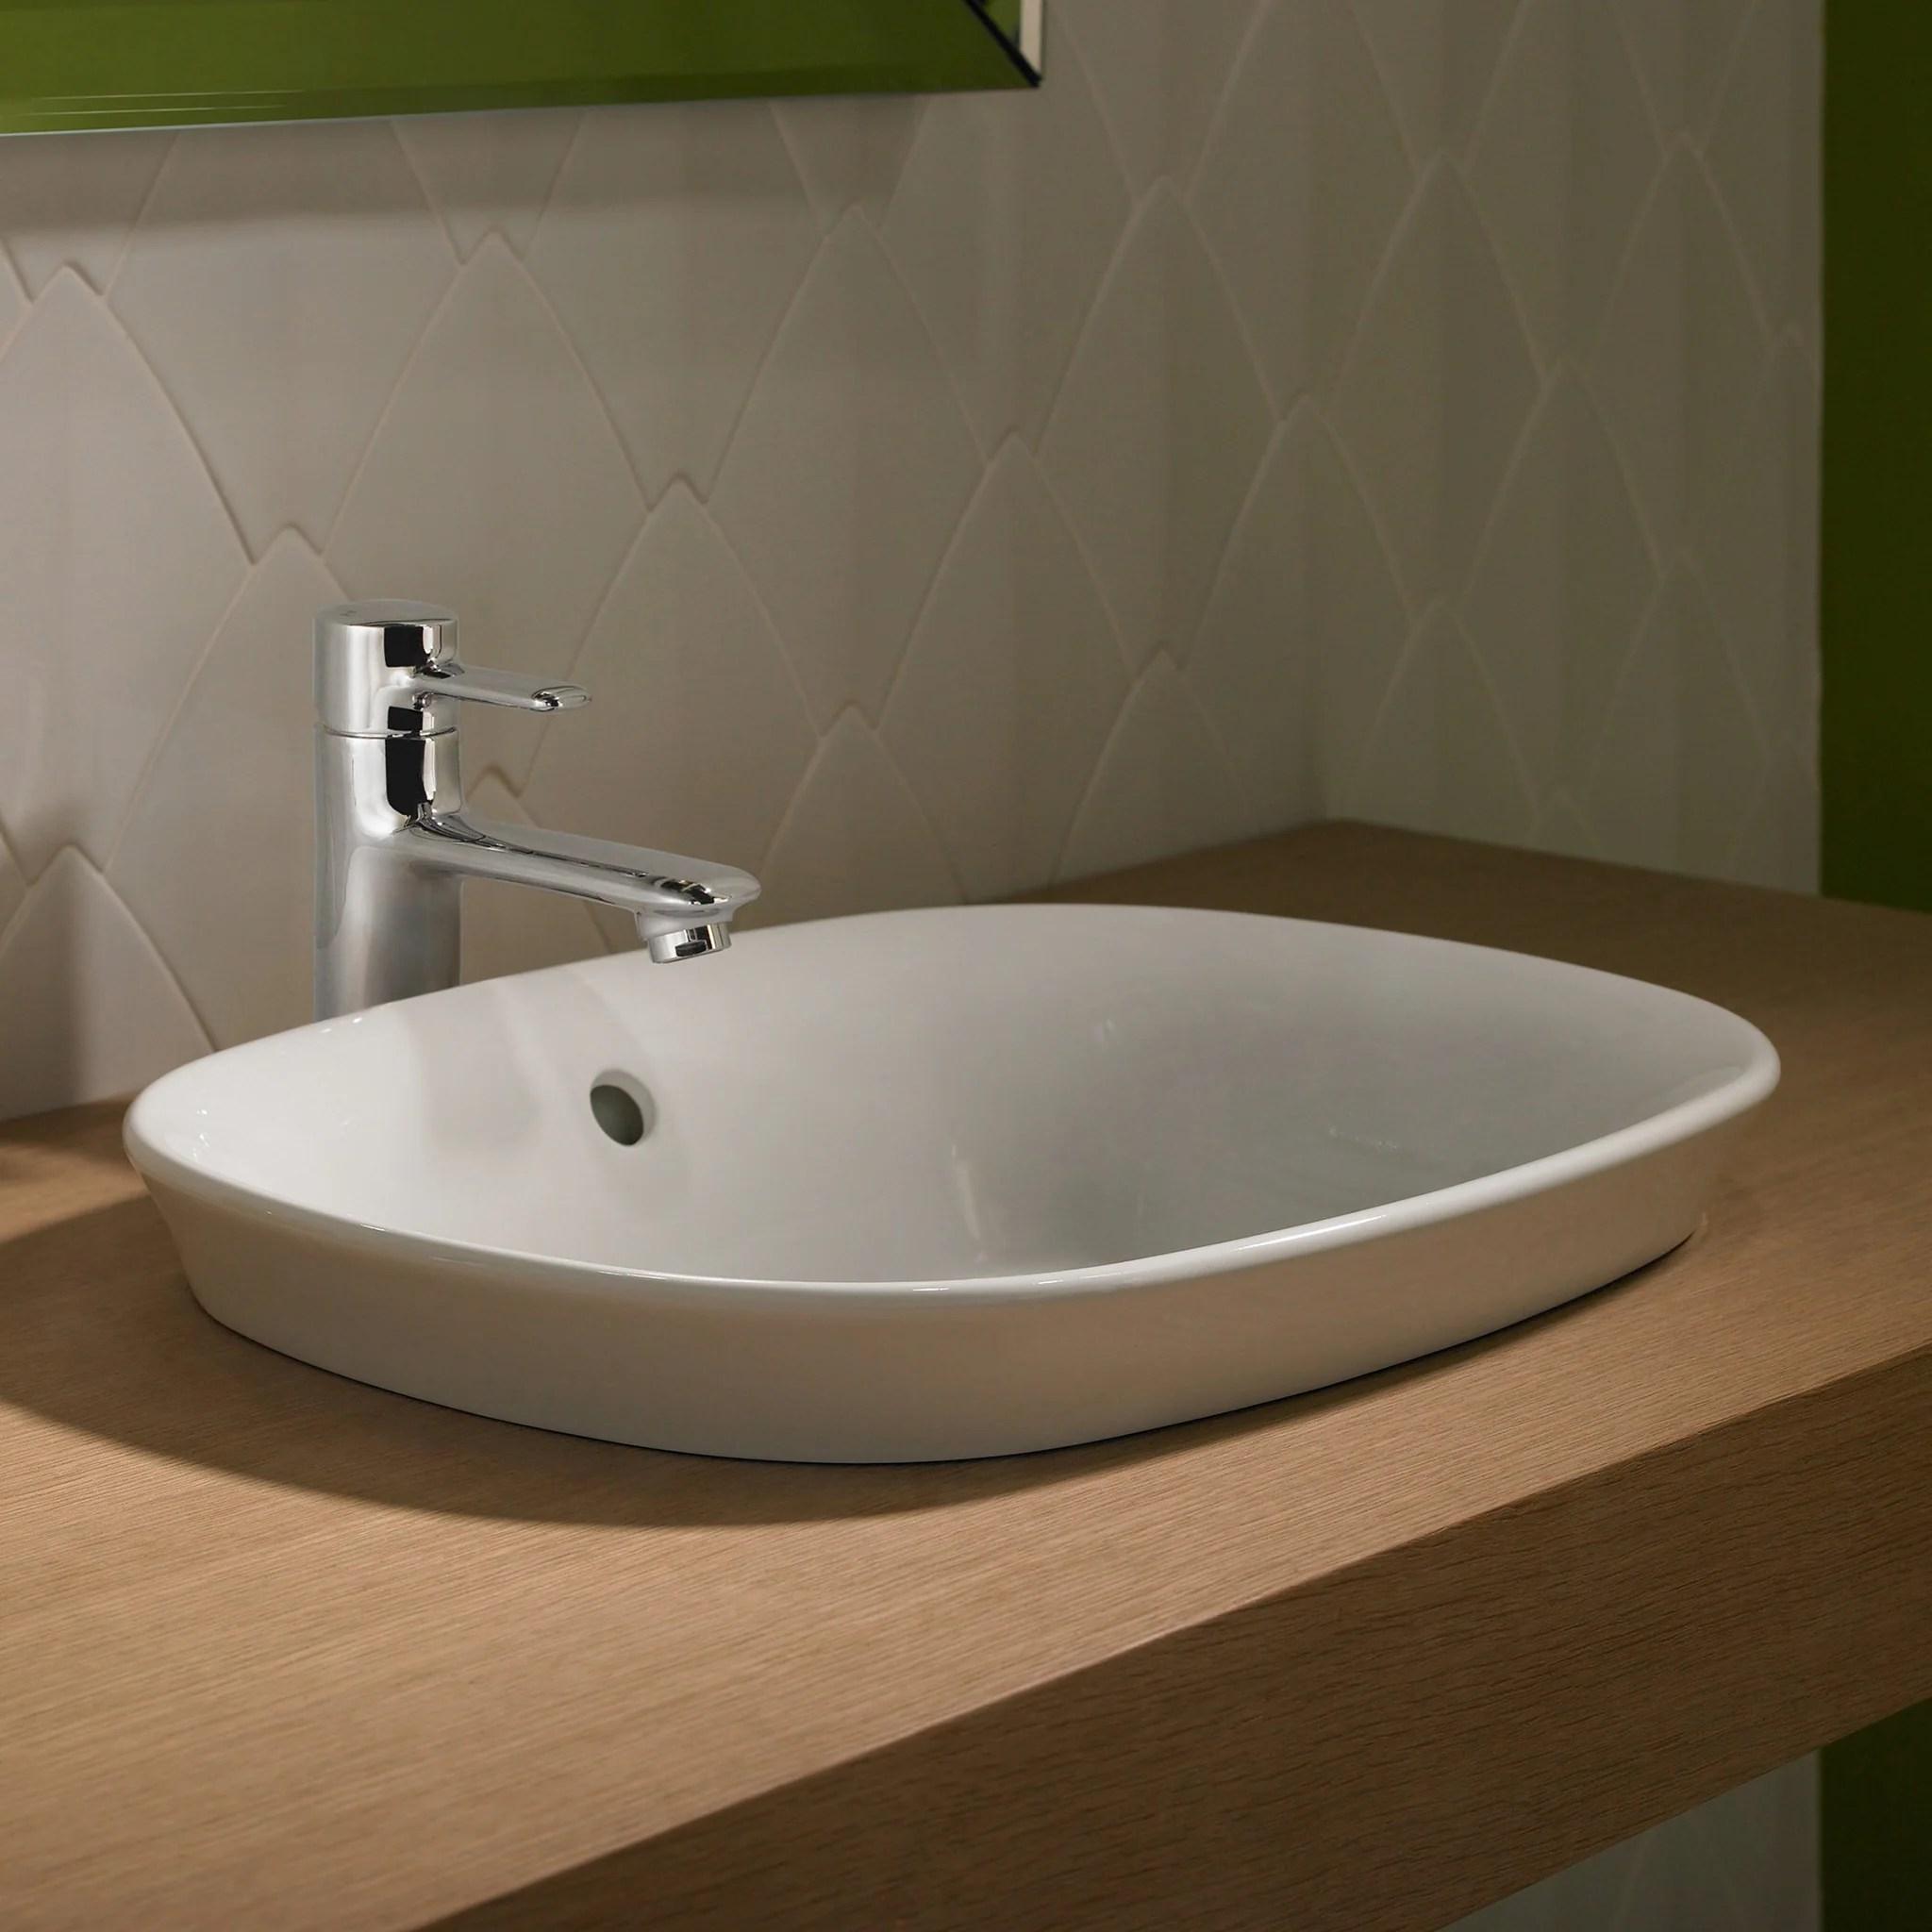 toto maris oval semi recessed vessel bathroom sink cotton white sku lt480g 01 sku lt480g 01